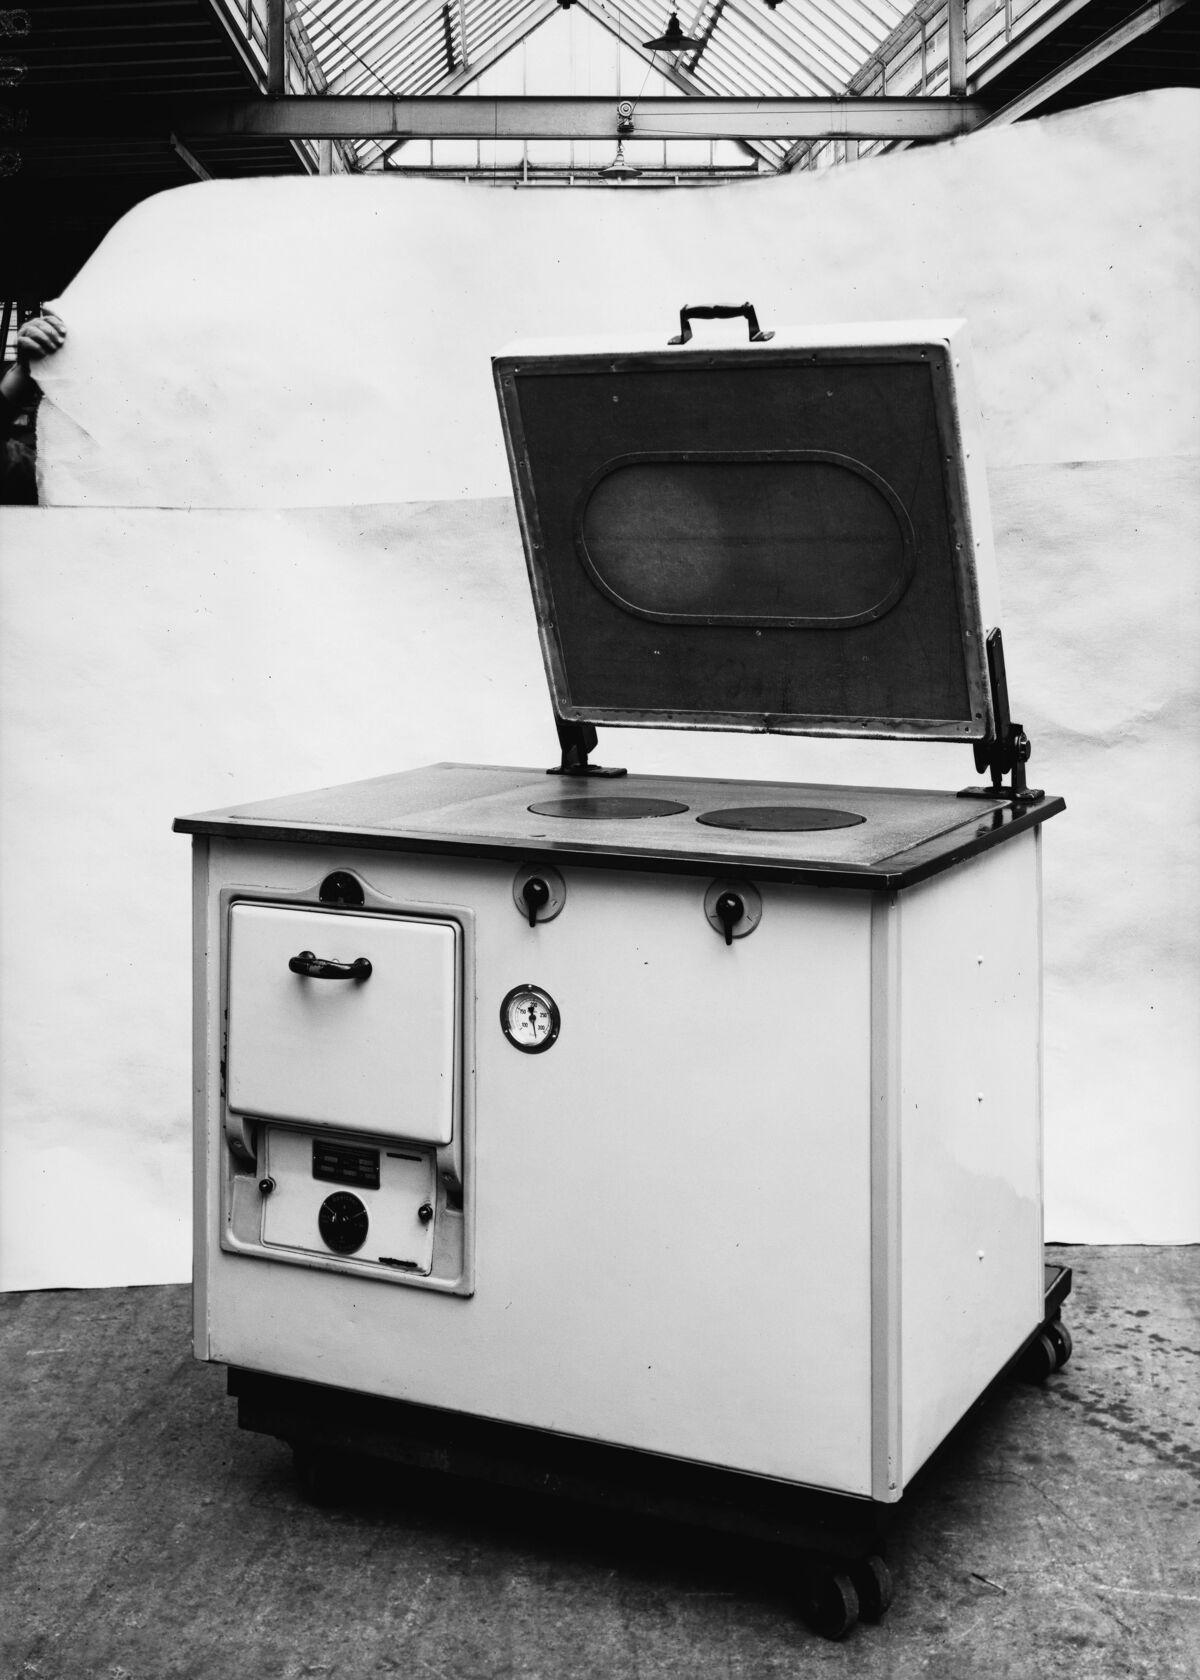 GFA 16/8508: Pilum storage stove